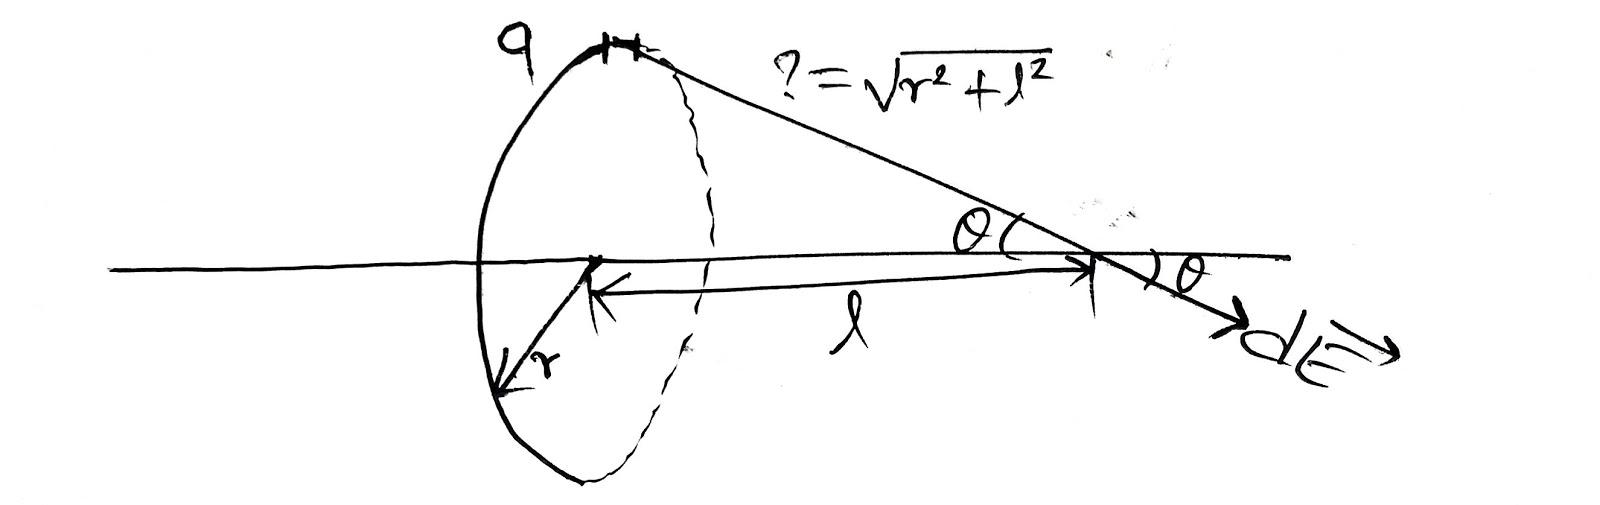 Book irodov pdf physics